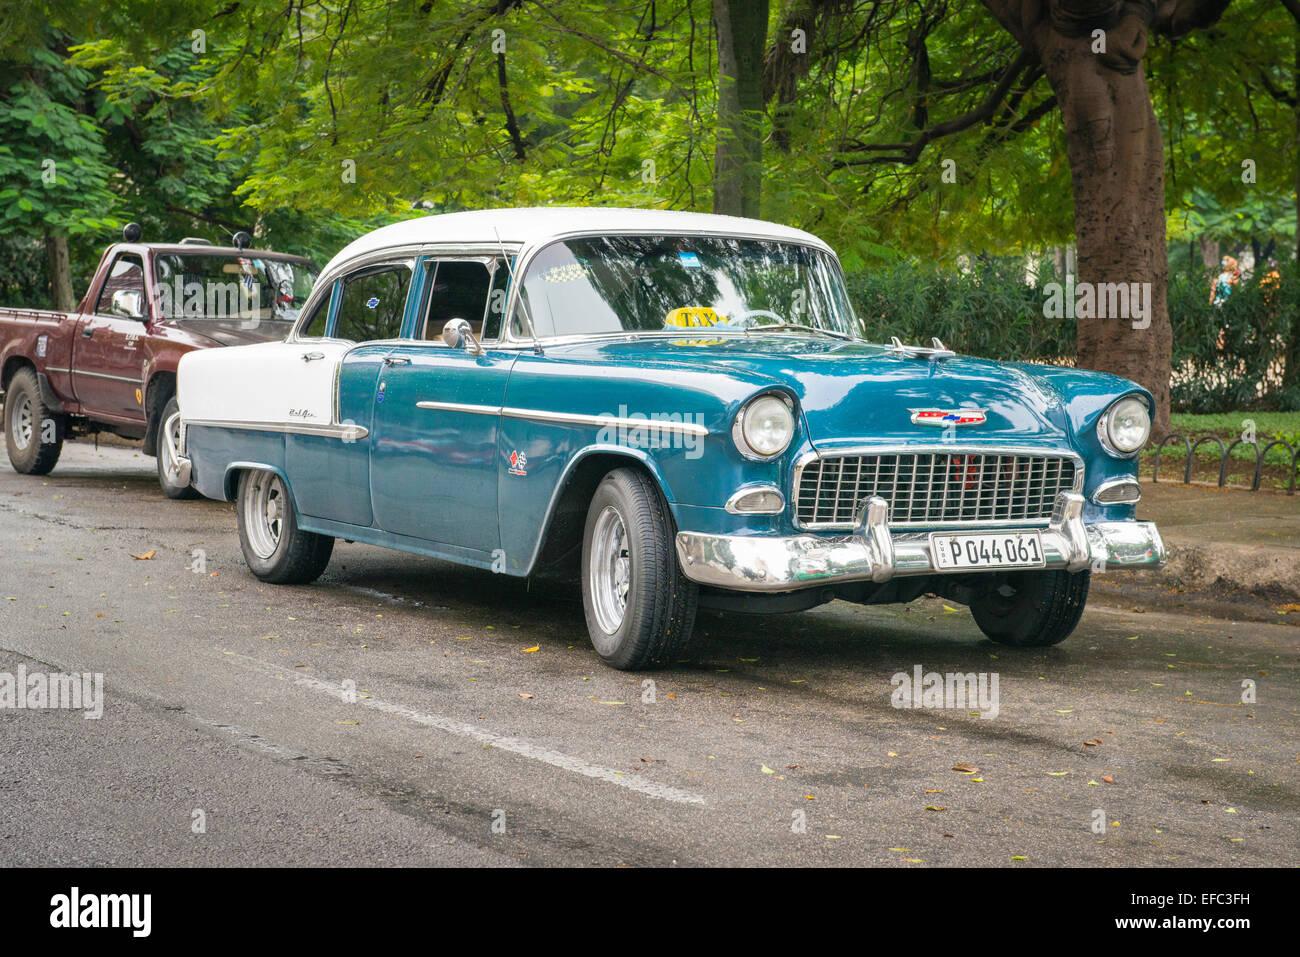 Cuba Old Havana La Habana Vieja blue white classic Chevrolet Chevy ...